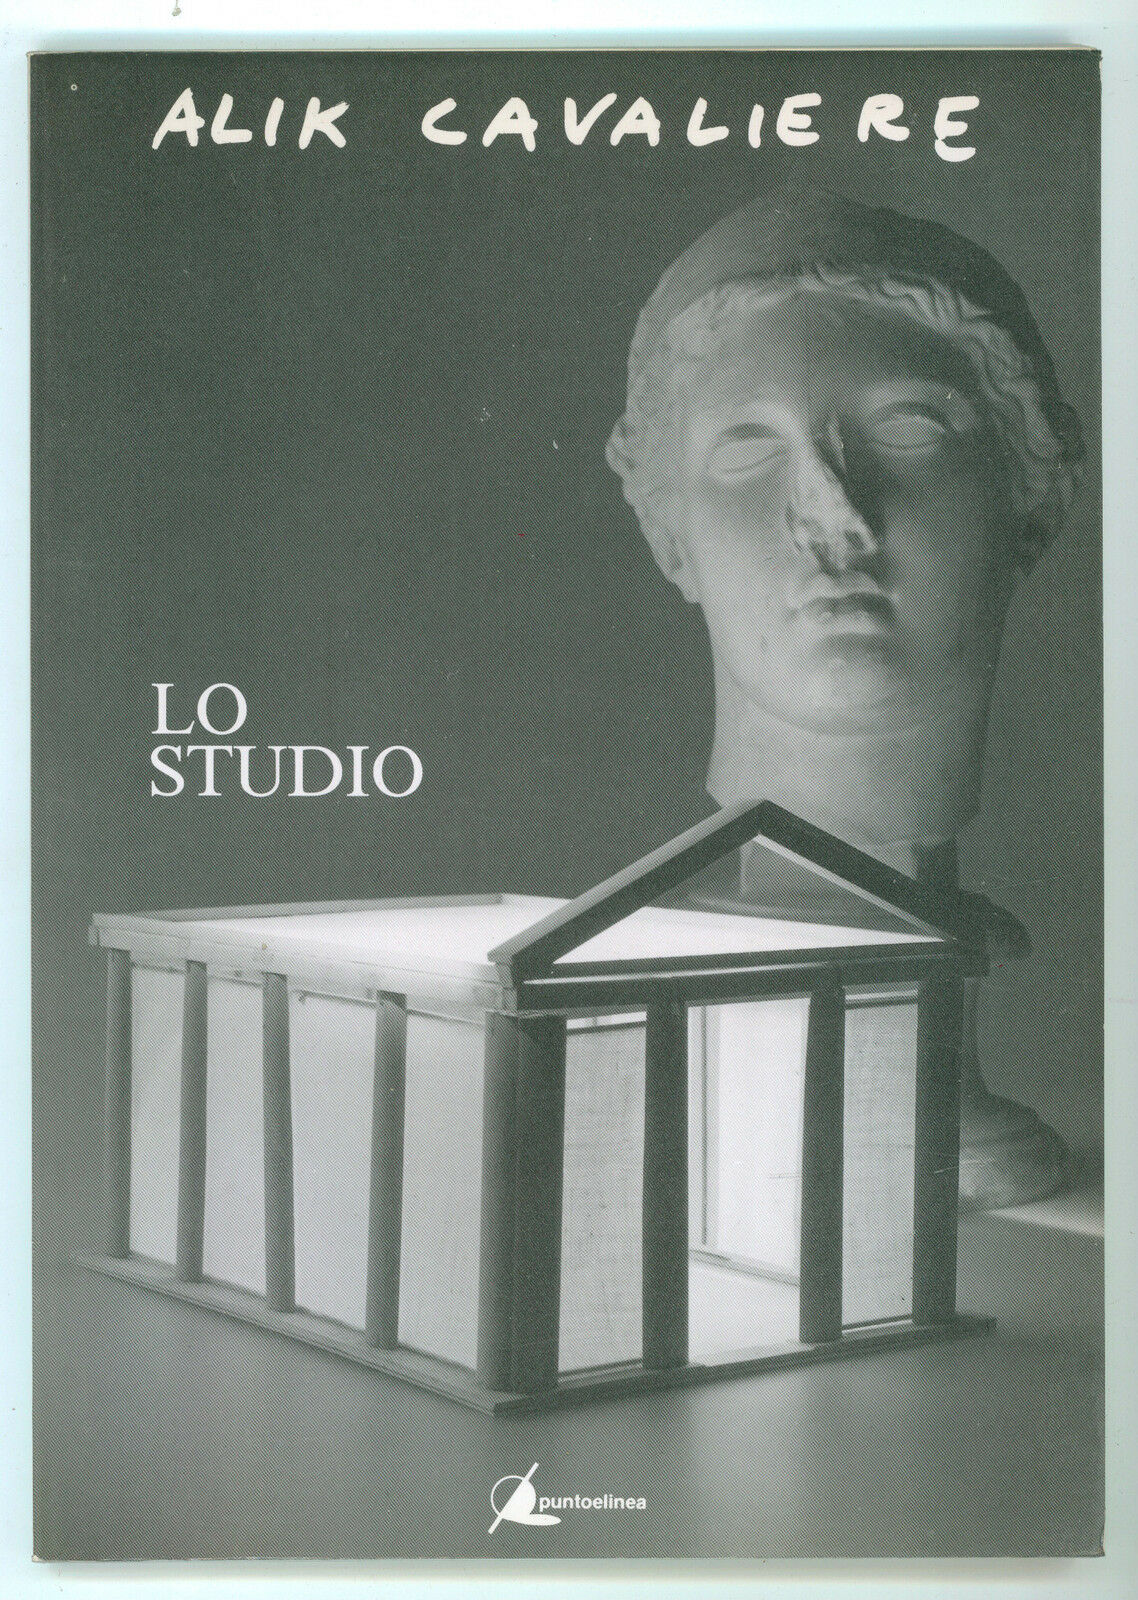 ALIK CAVALIERE LO STUDIO PUNTO E LINEA 1990 AUTOGRAFO ARTE SCULTURA